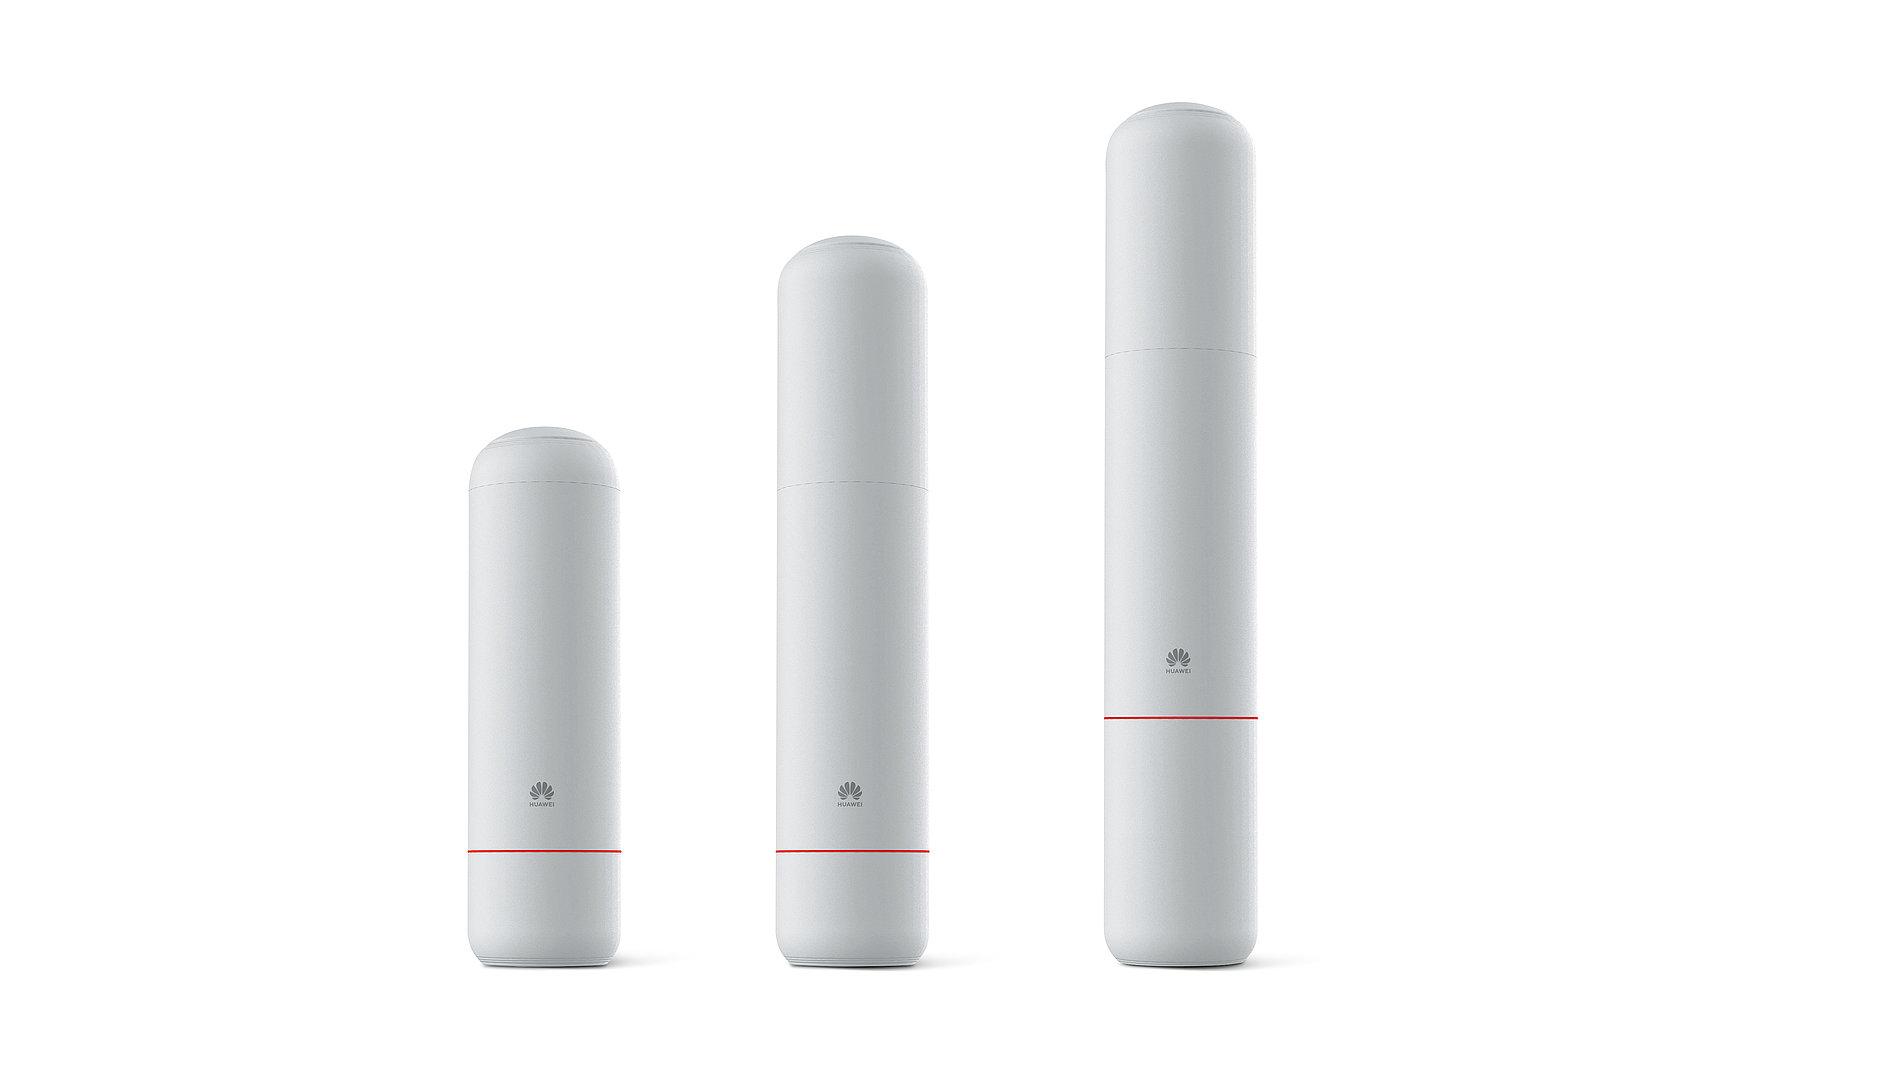 Huawei AirEngine 8760R Series | Red Dot Design Award